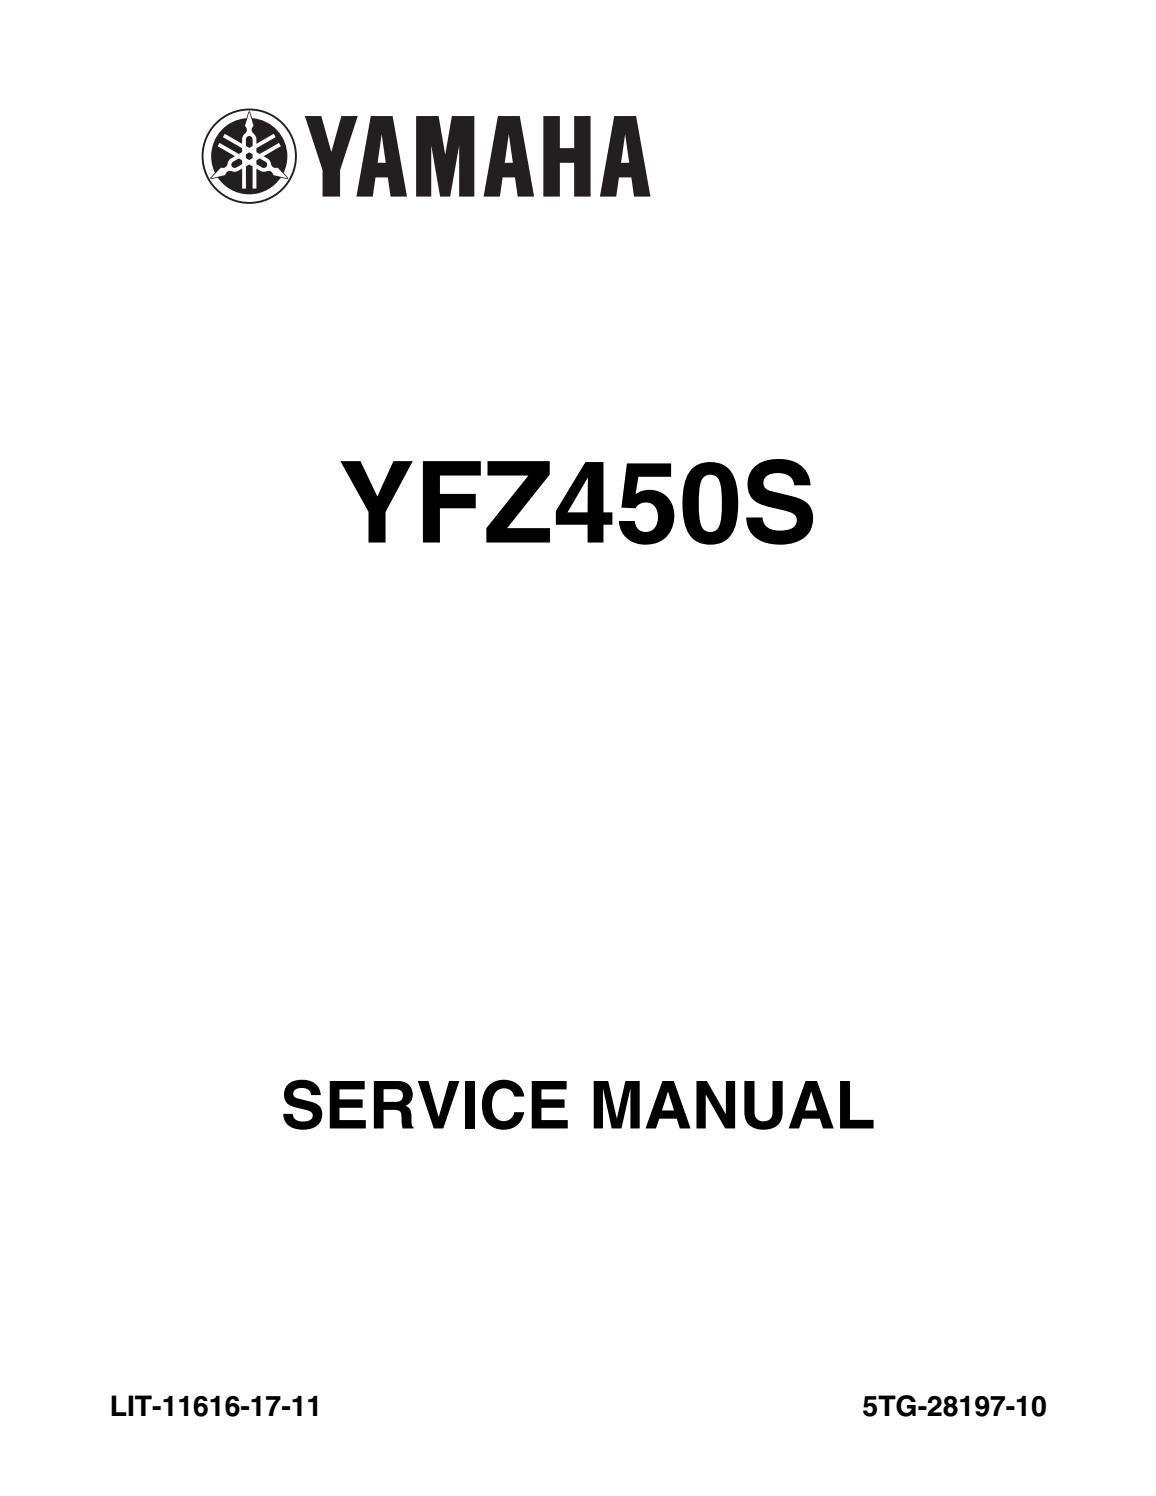 2004 2013 yamaha yfz 450 atv service repair manual yfz450 highly detailed  fsm pdf preview by heydownloads - issuu  issuu